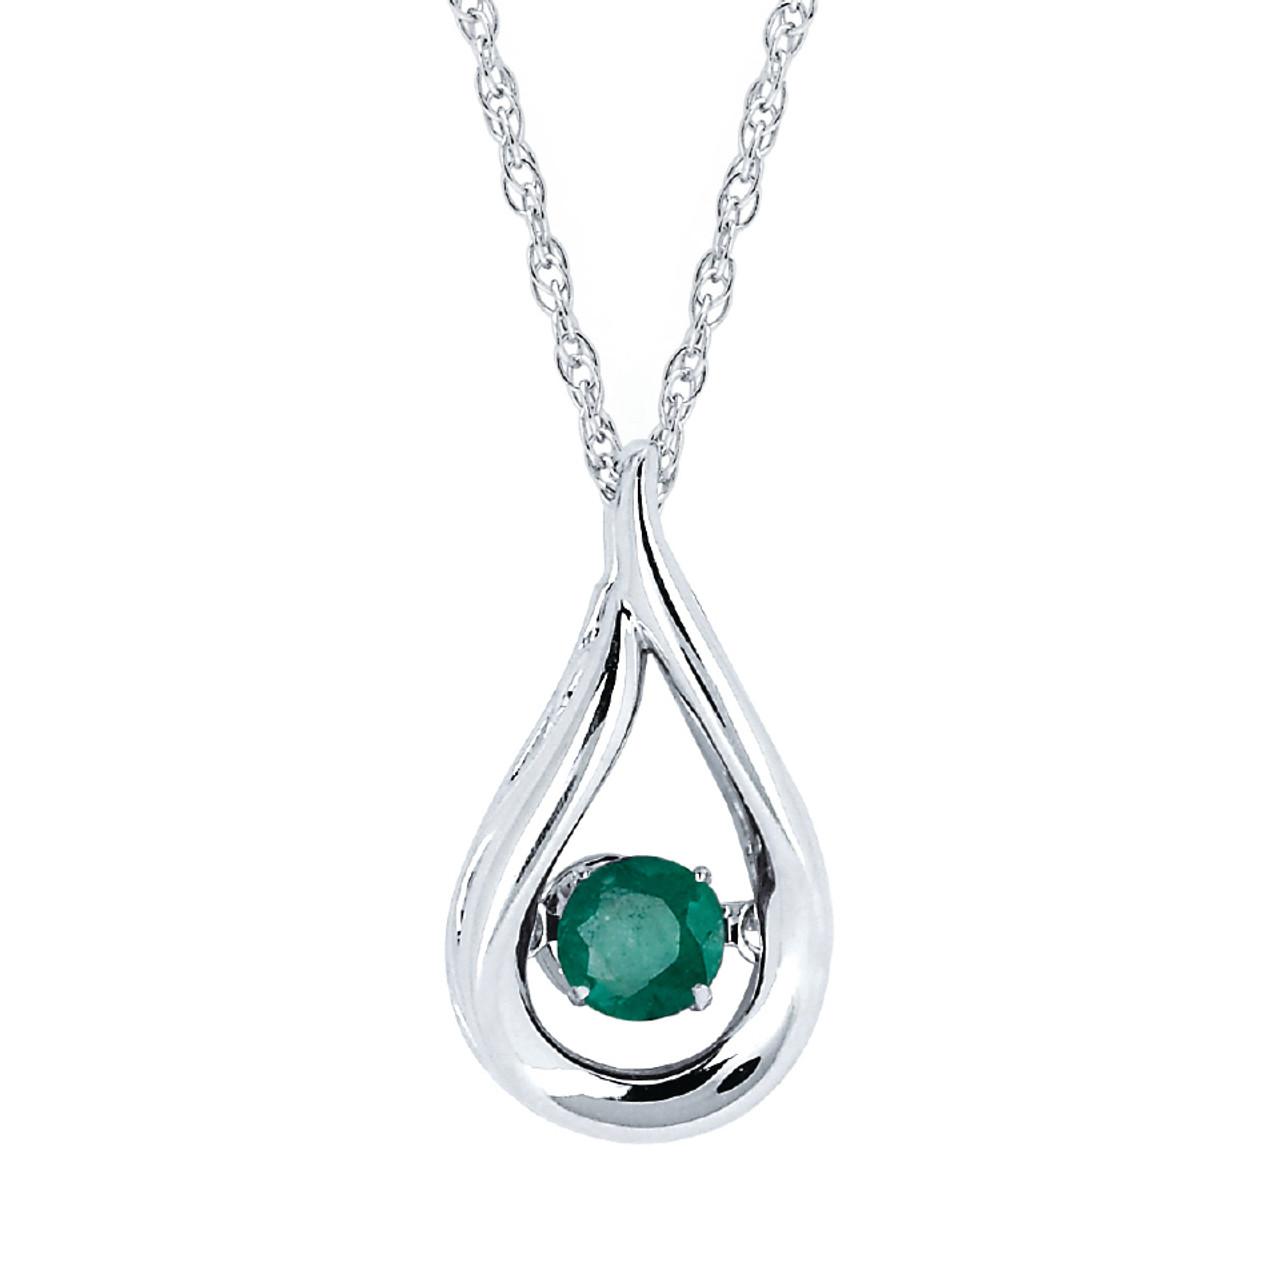 Sterling silver emerald floating gemstone pendant necklace 18 sterling silver emerald floating gemstone pendant necklace 18 aloadofball Images